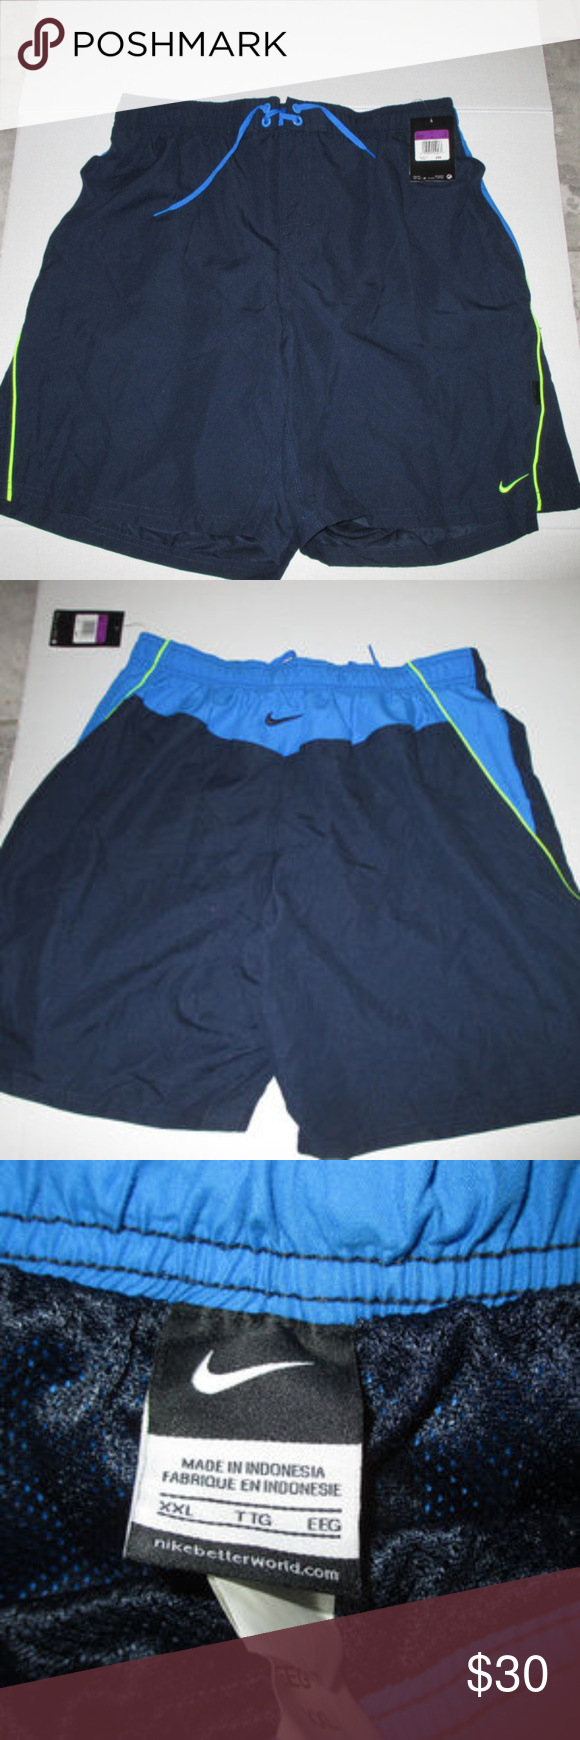 503564cd9f Nike XXl bathing suit mens Nike Sheds Water bathing trunks brand new Nike  Swim Swim Trunks